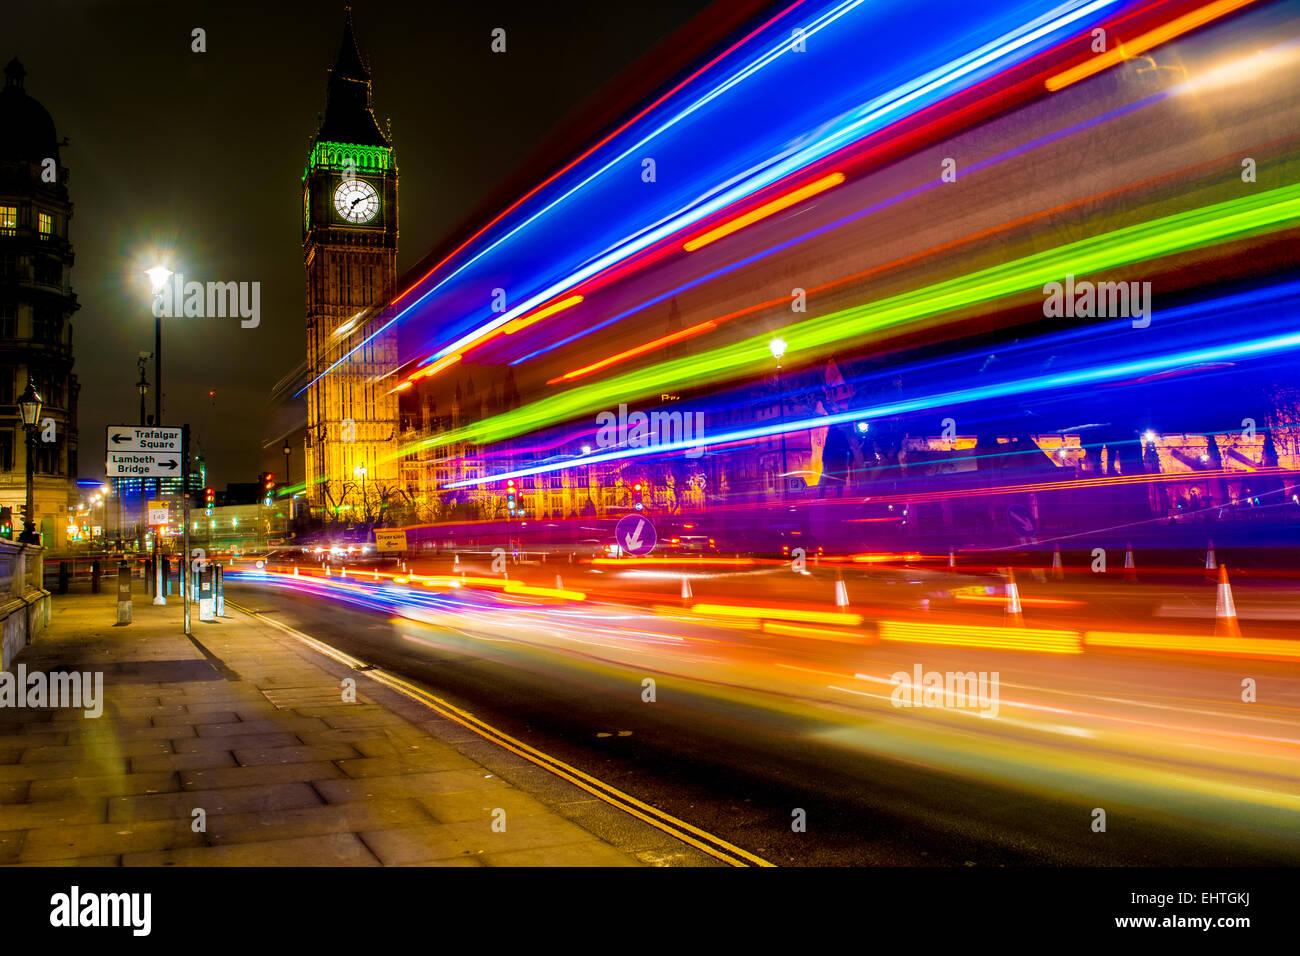 Buses Around Big Ben (2) - Stock Image